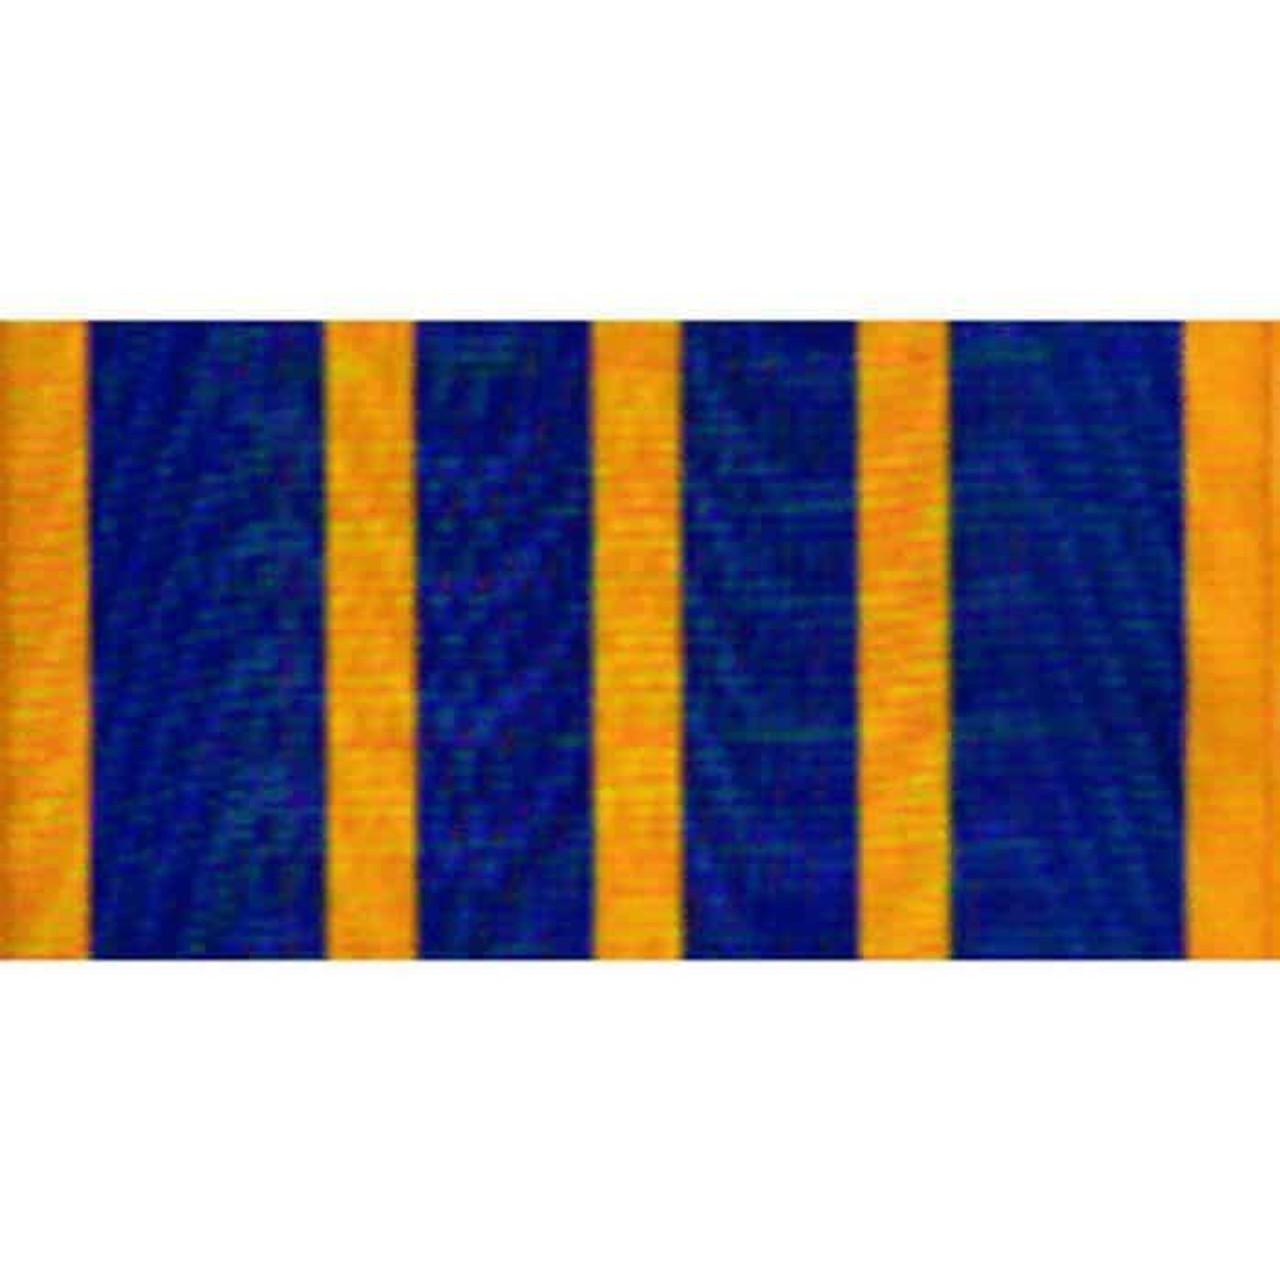 Luxembourg Croix de Guerre Streamer